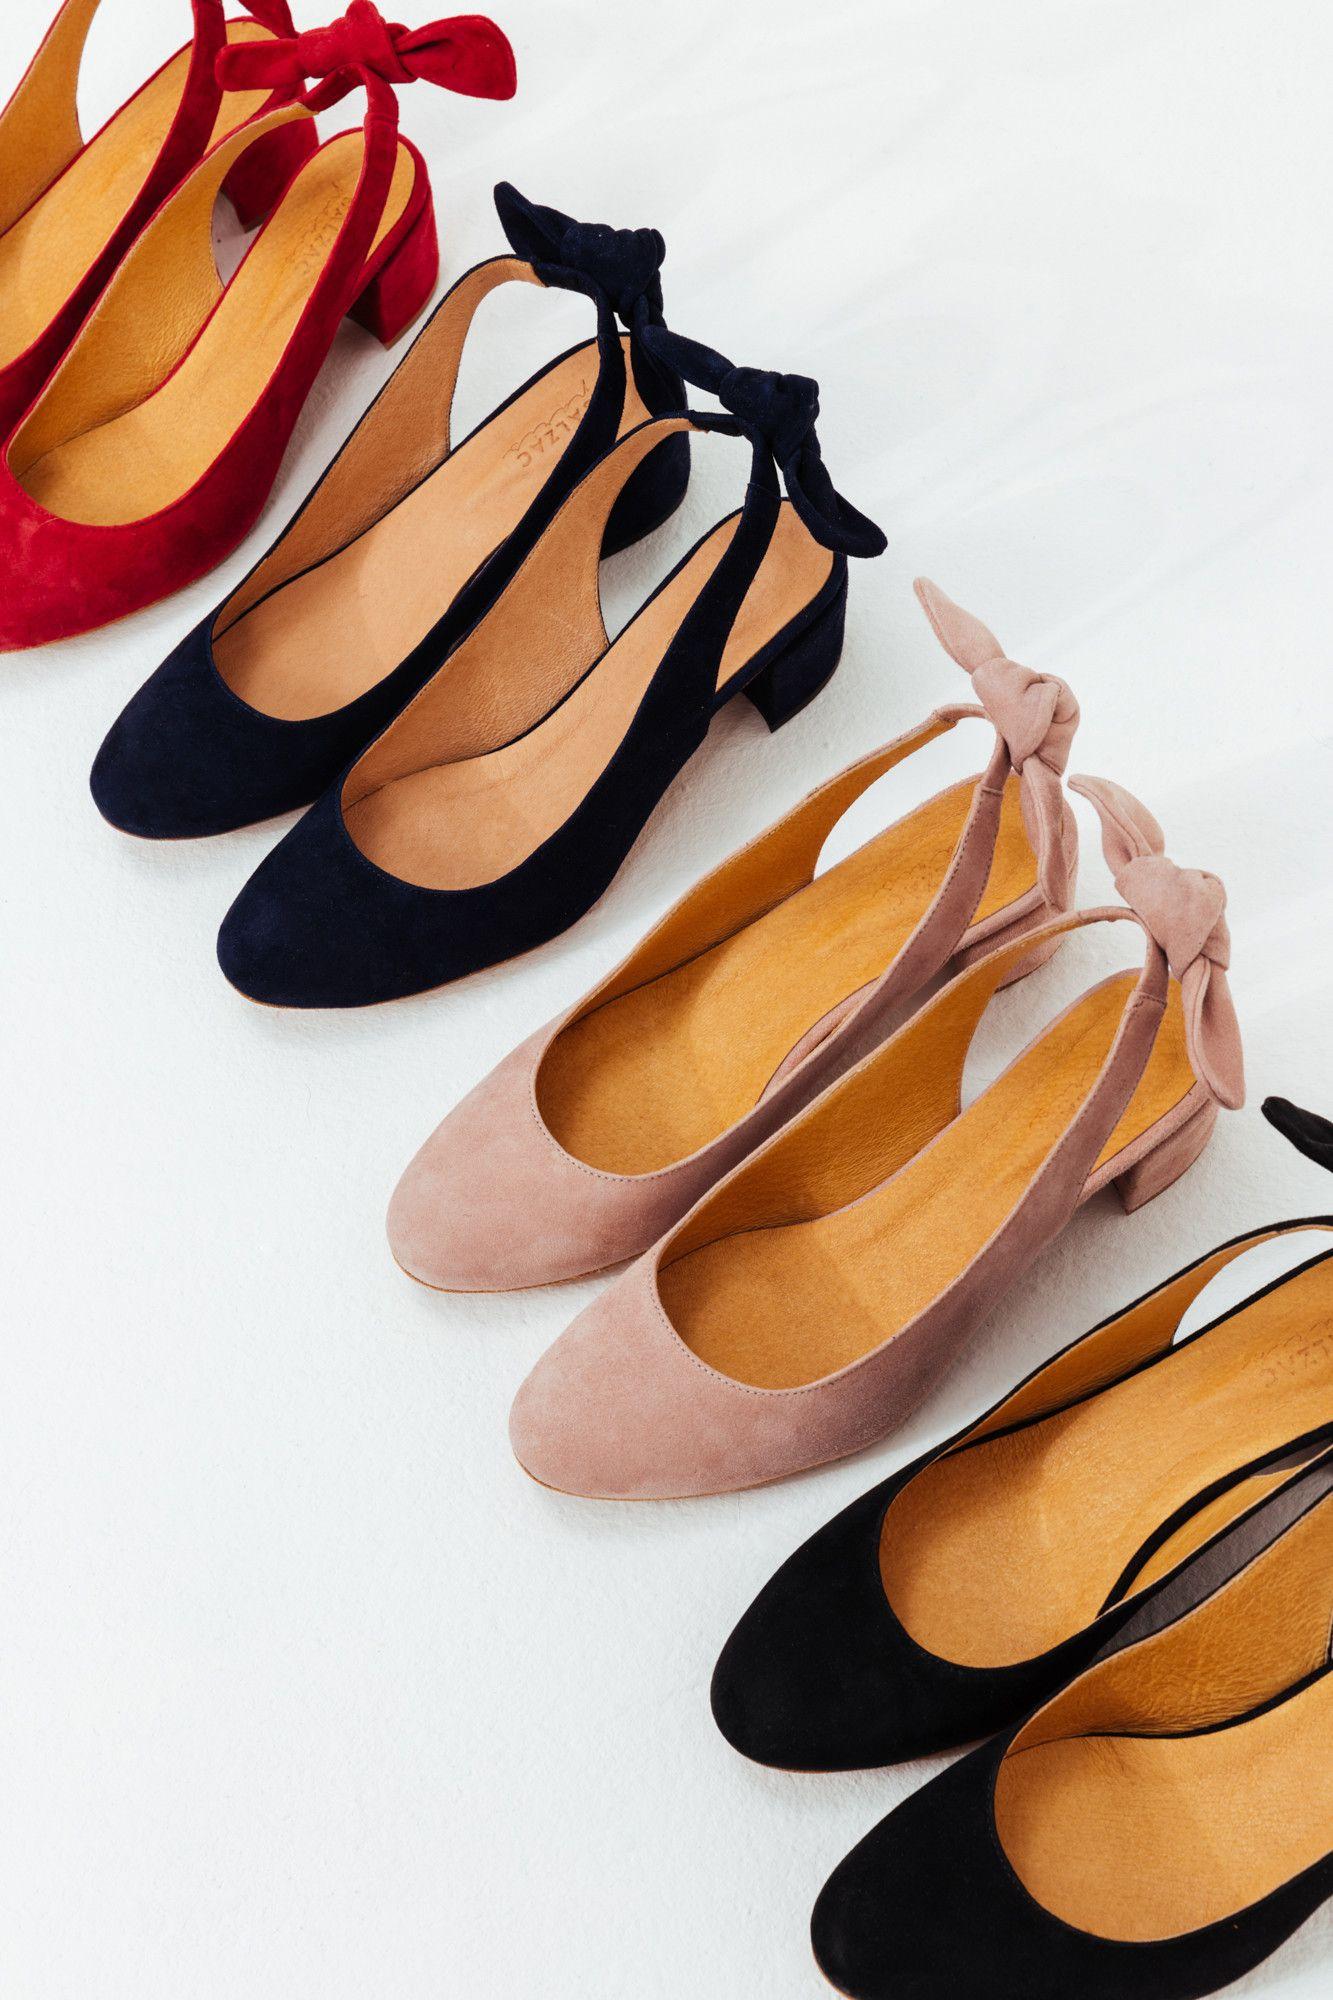 ef7afb38fa6afb Ballerines Odette marine - Balzac Paris Chaussure Plate Femme, Belle  Chaussure, Chaussure Ballerine,